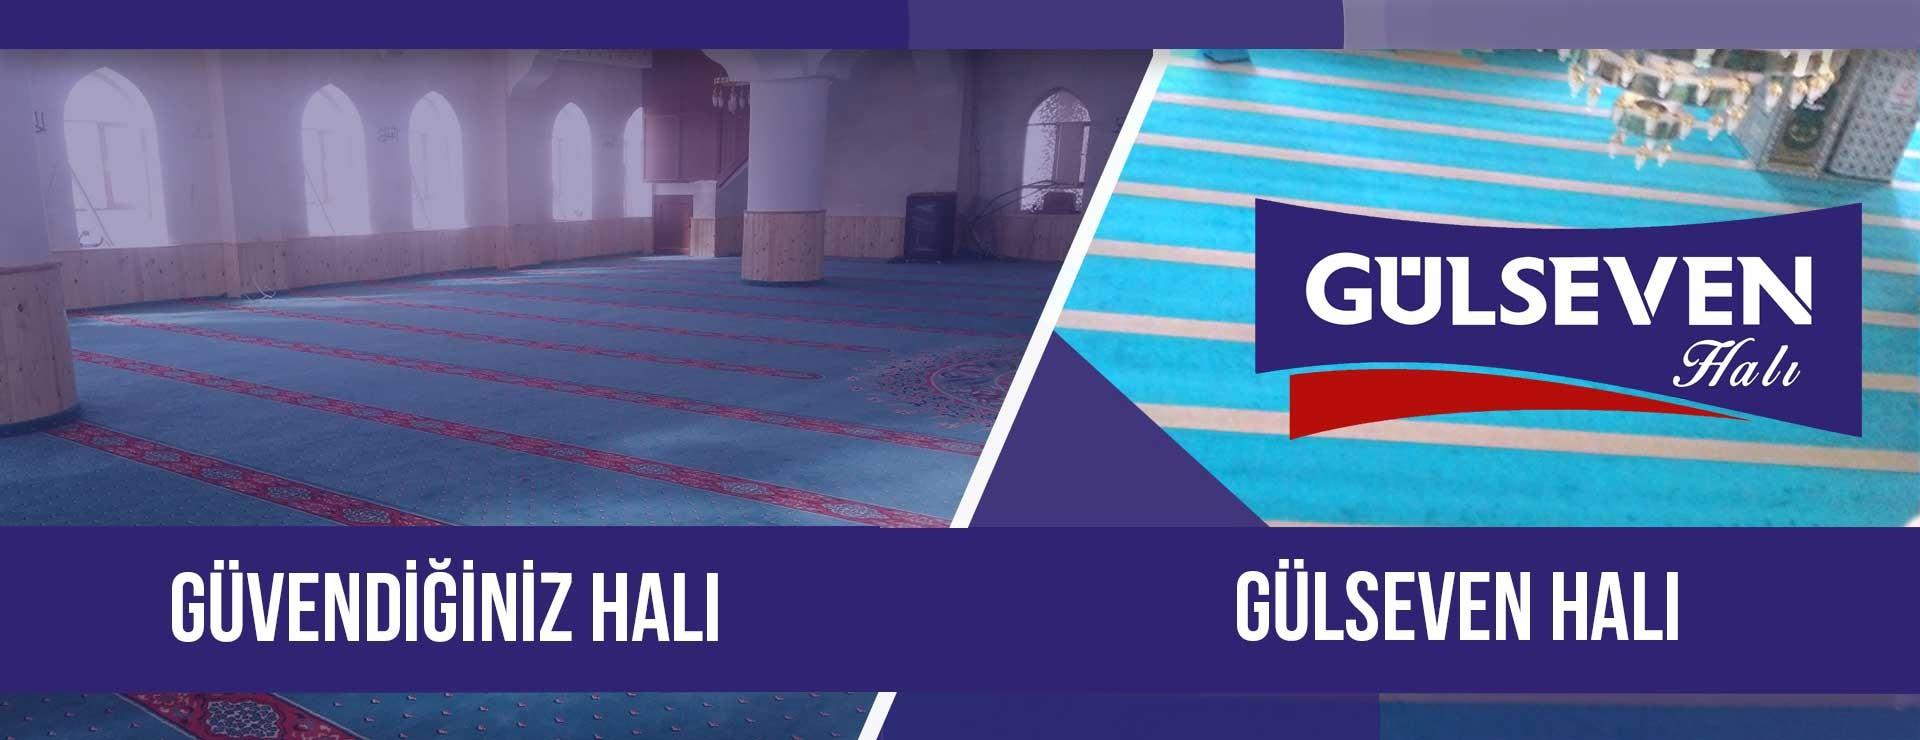 www.gulsevenhali.com